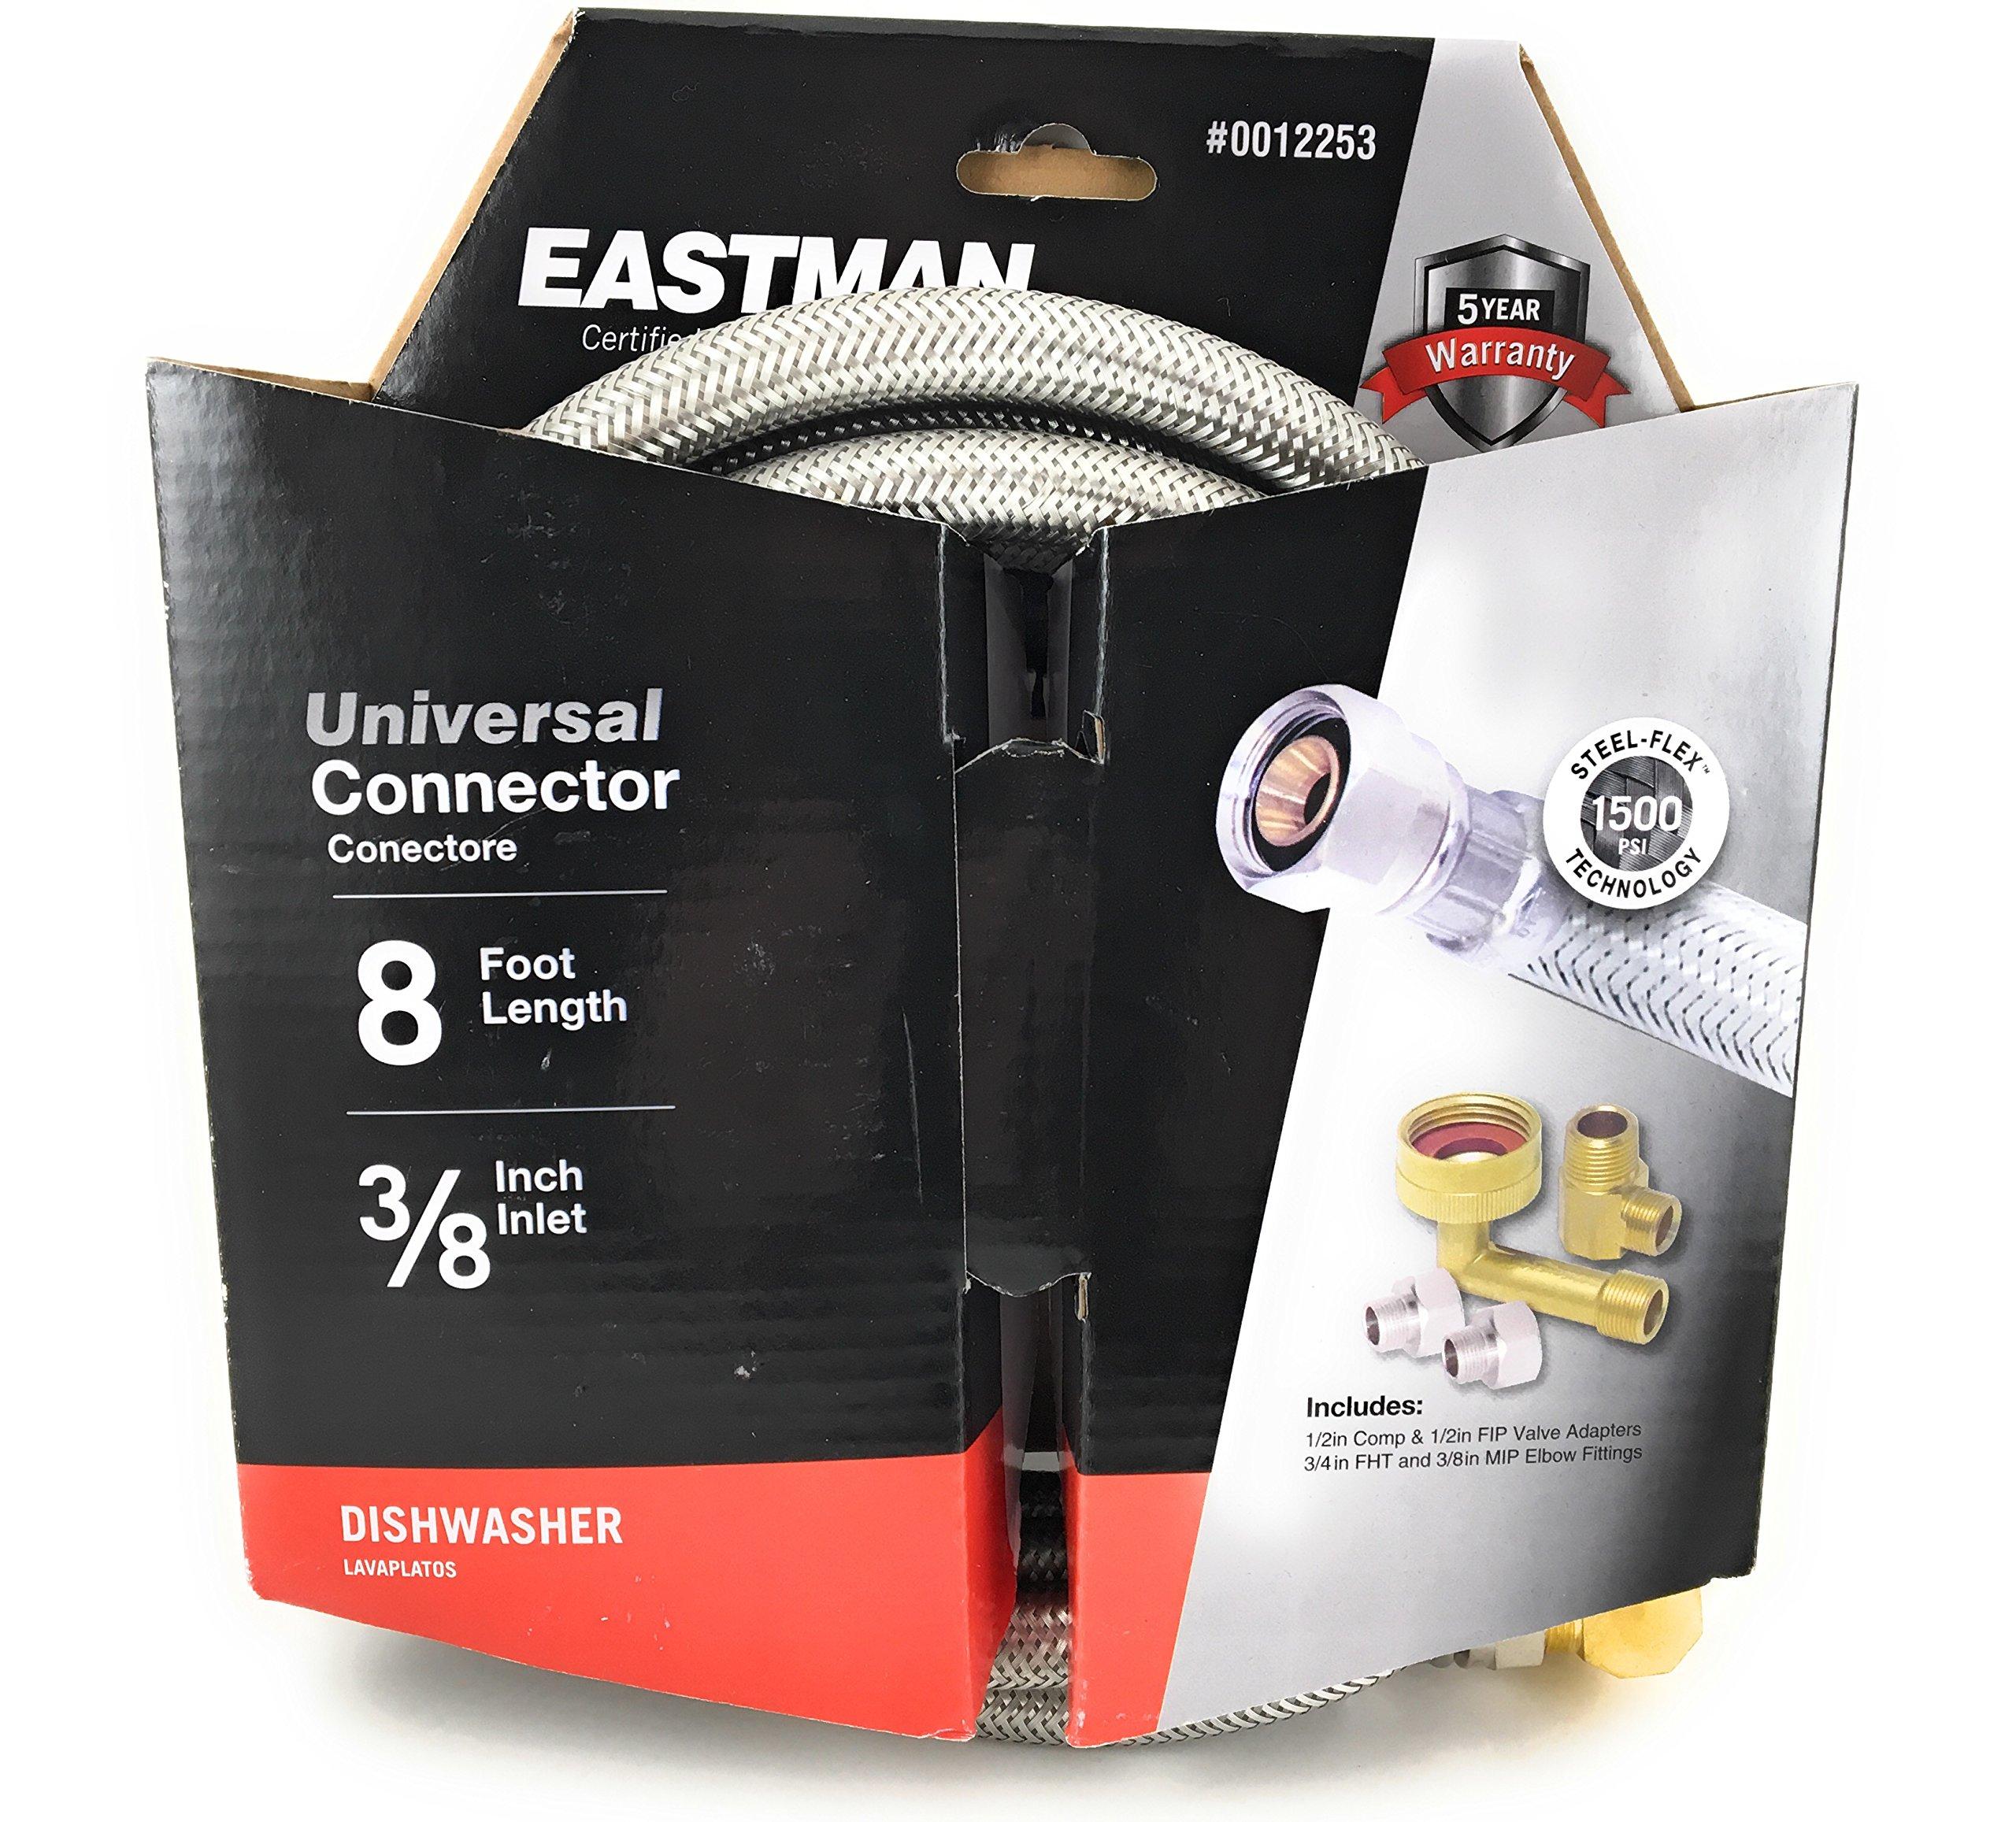 Eastman 8' Universal Dishwasher Connector